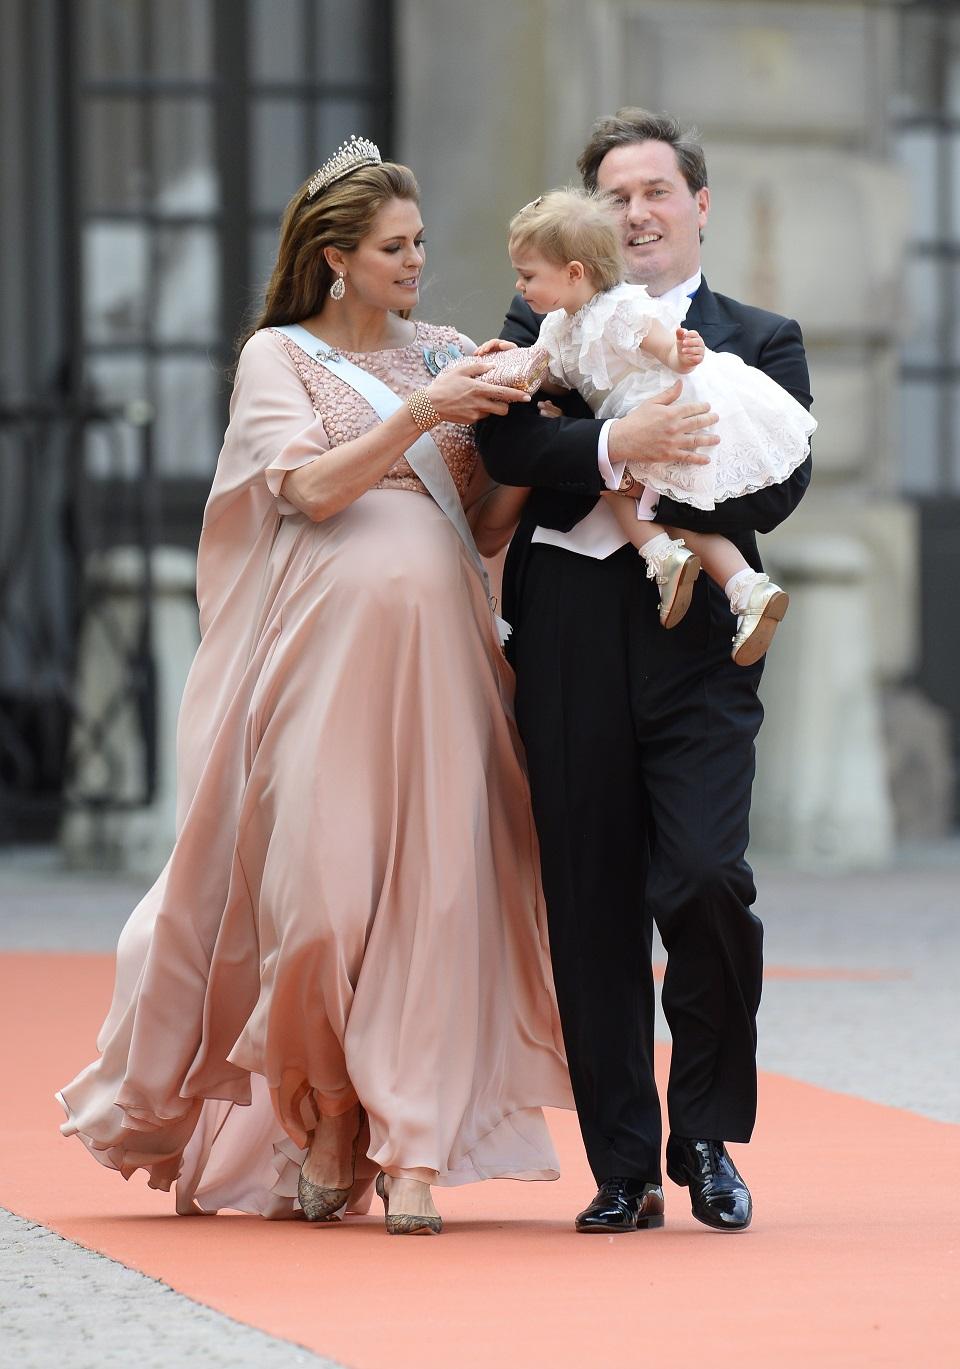 Sweden S Princess Madeleine Gives Birth To Son Lifestyle